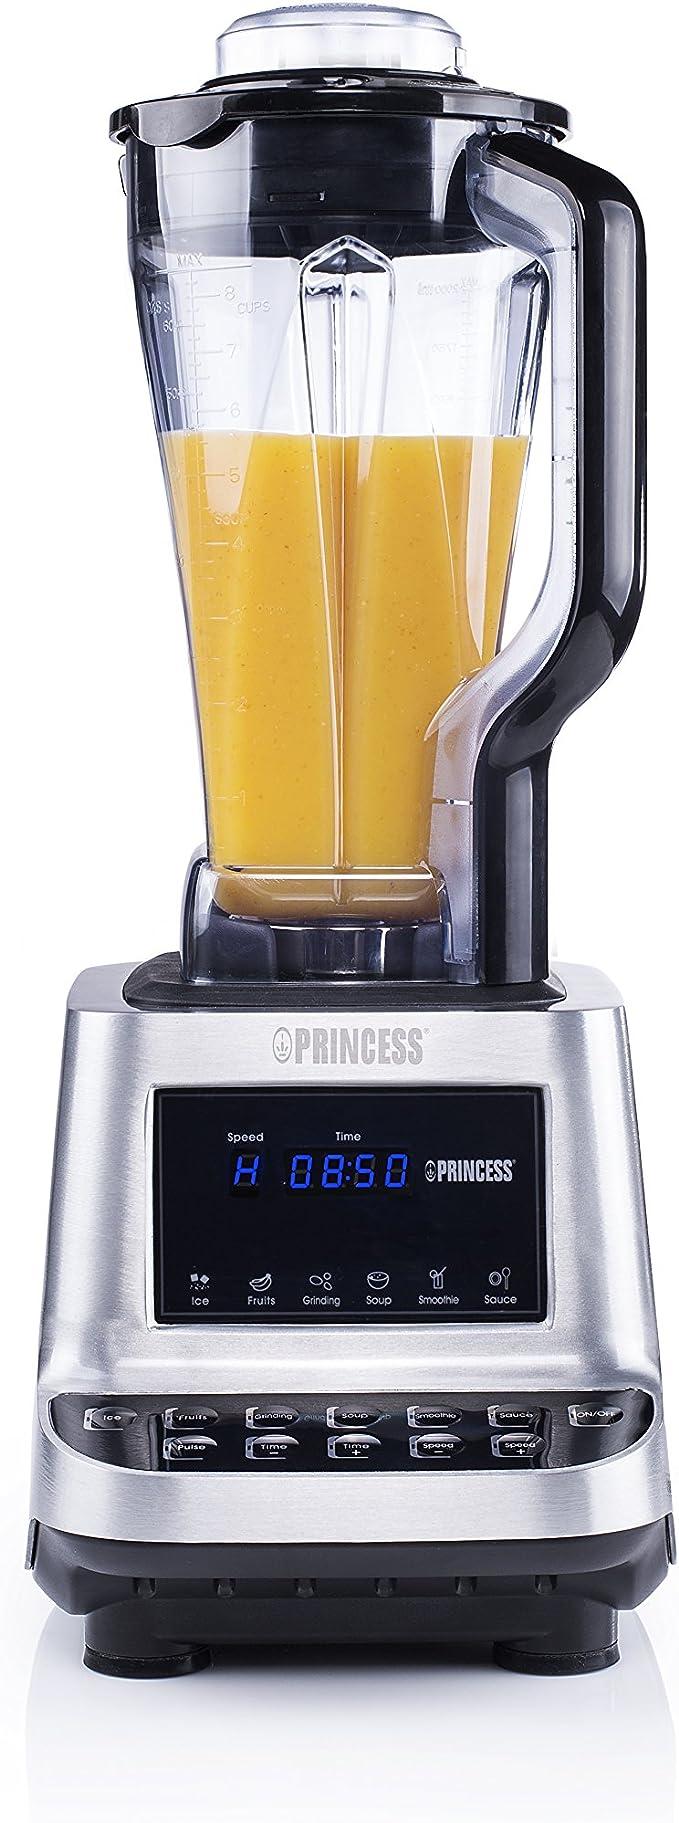 Princess 219000 Batidora Healthy Turbo 01.219000.01.001, 1600 W, 2 ...